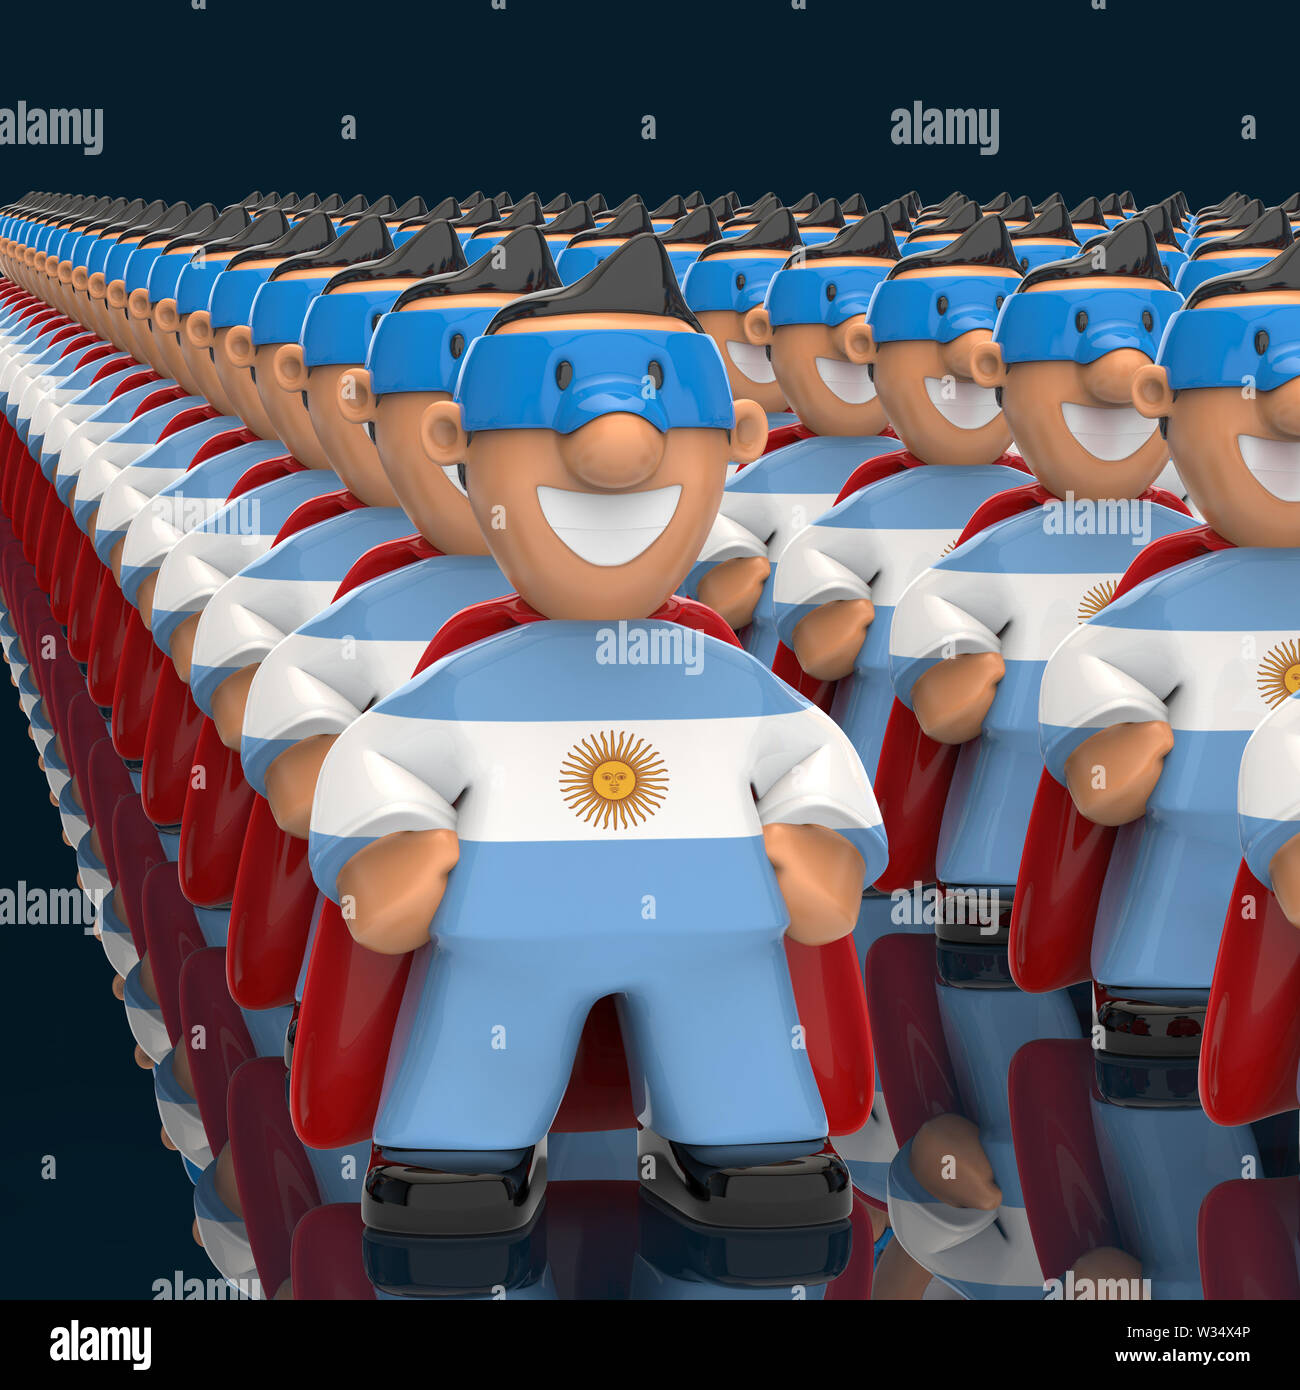 Superhero concept - 3D Illustration - Stock Image